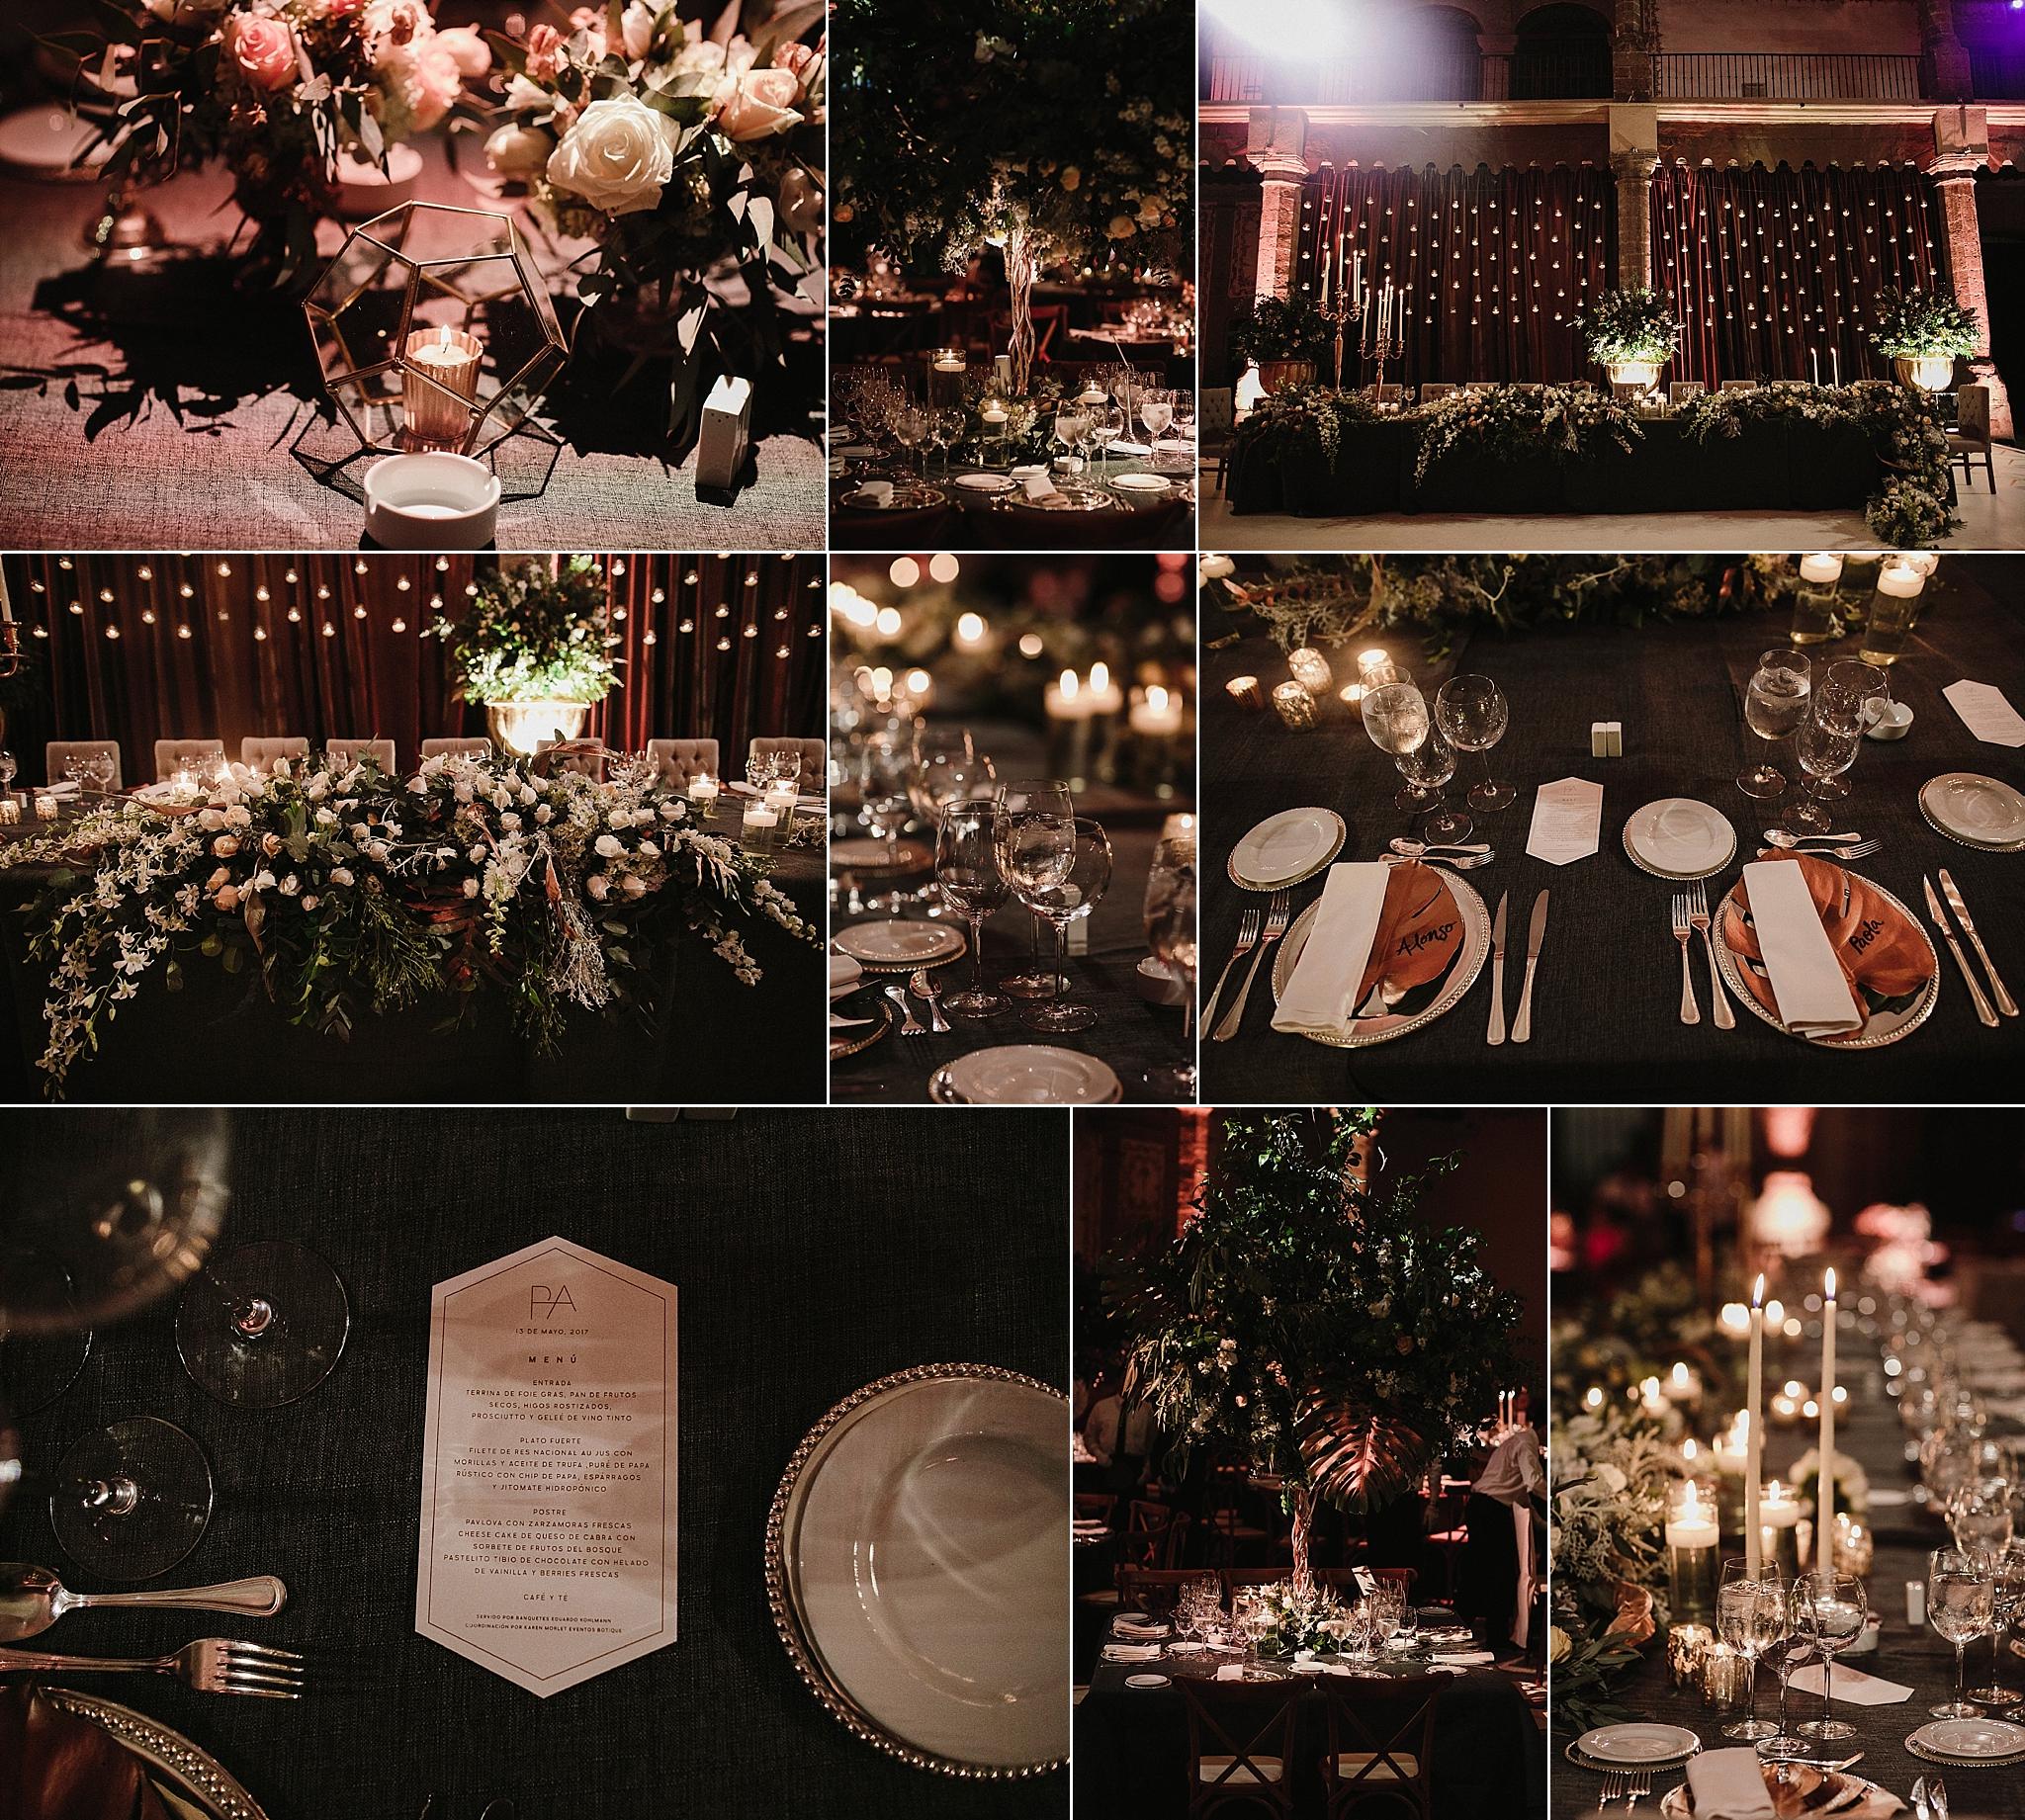 alfonso_flores_destination_wedding_photogrpahy_paola_alonso-684.jpg